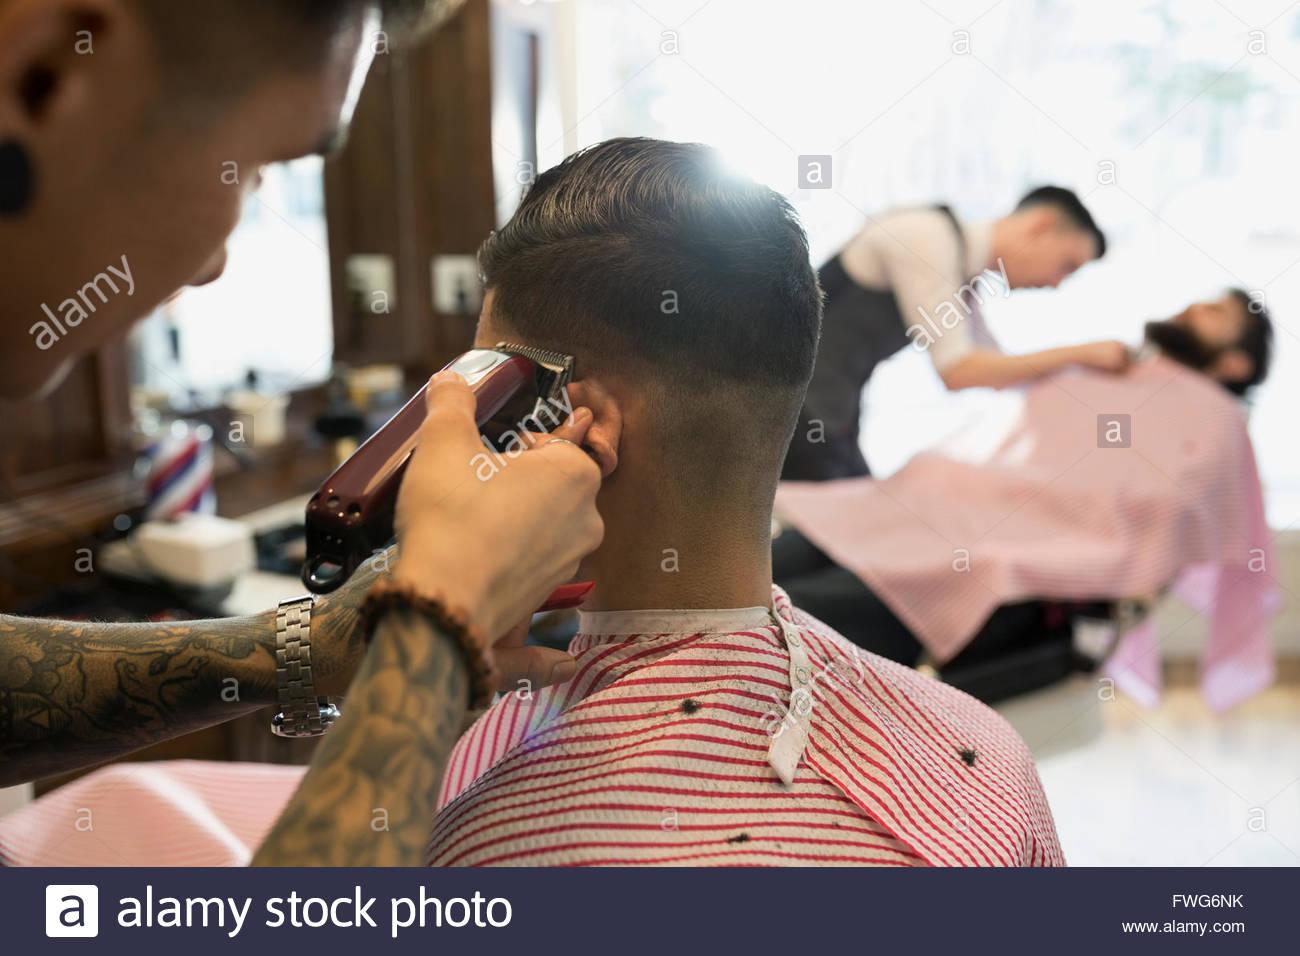 Barber shaving man - Stock Image